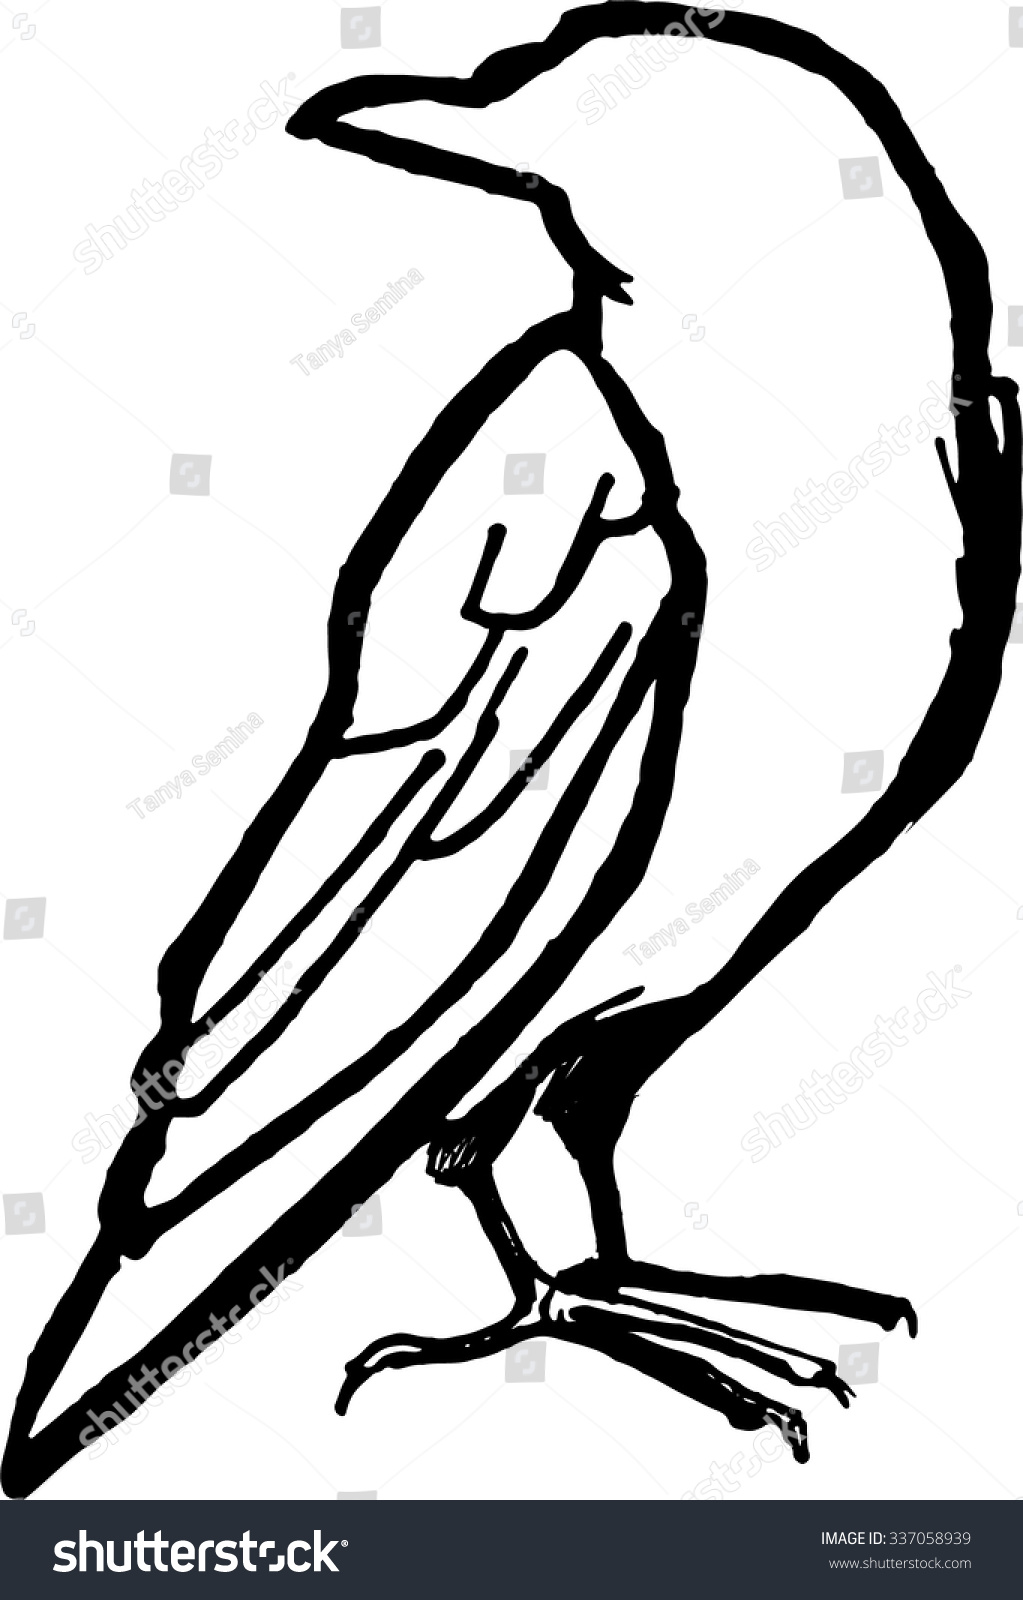 Line Drawing Raven : Raven line drawing pixshark images galleries